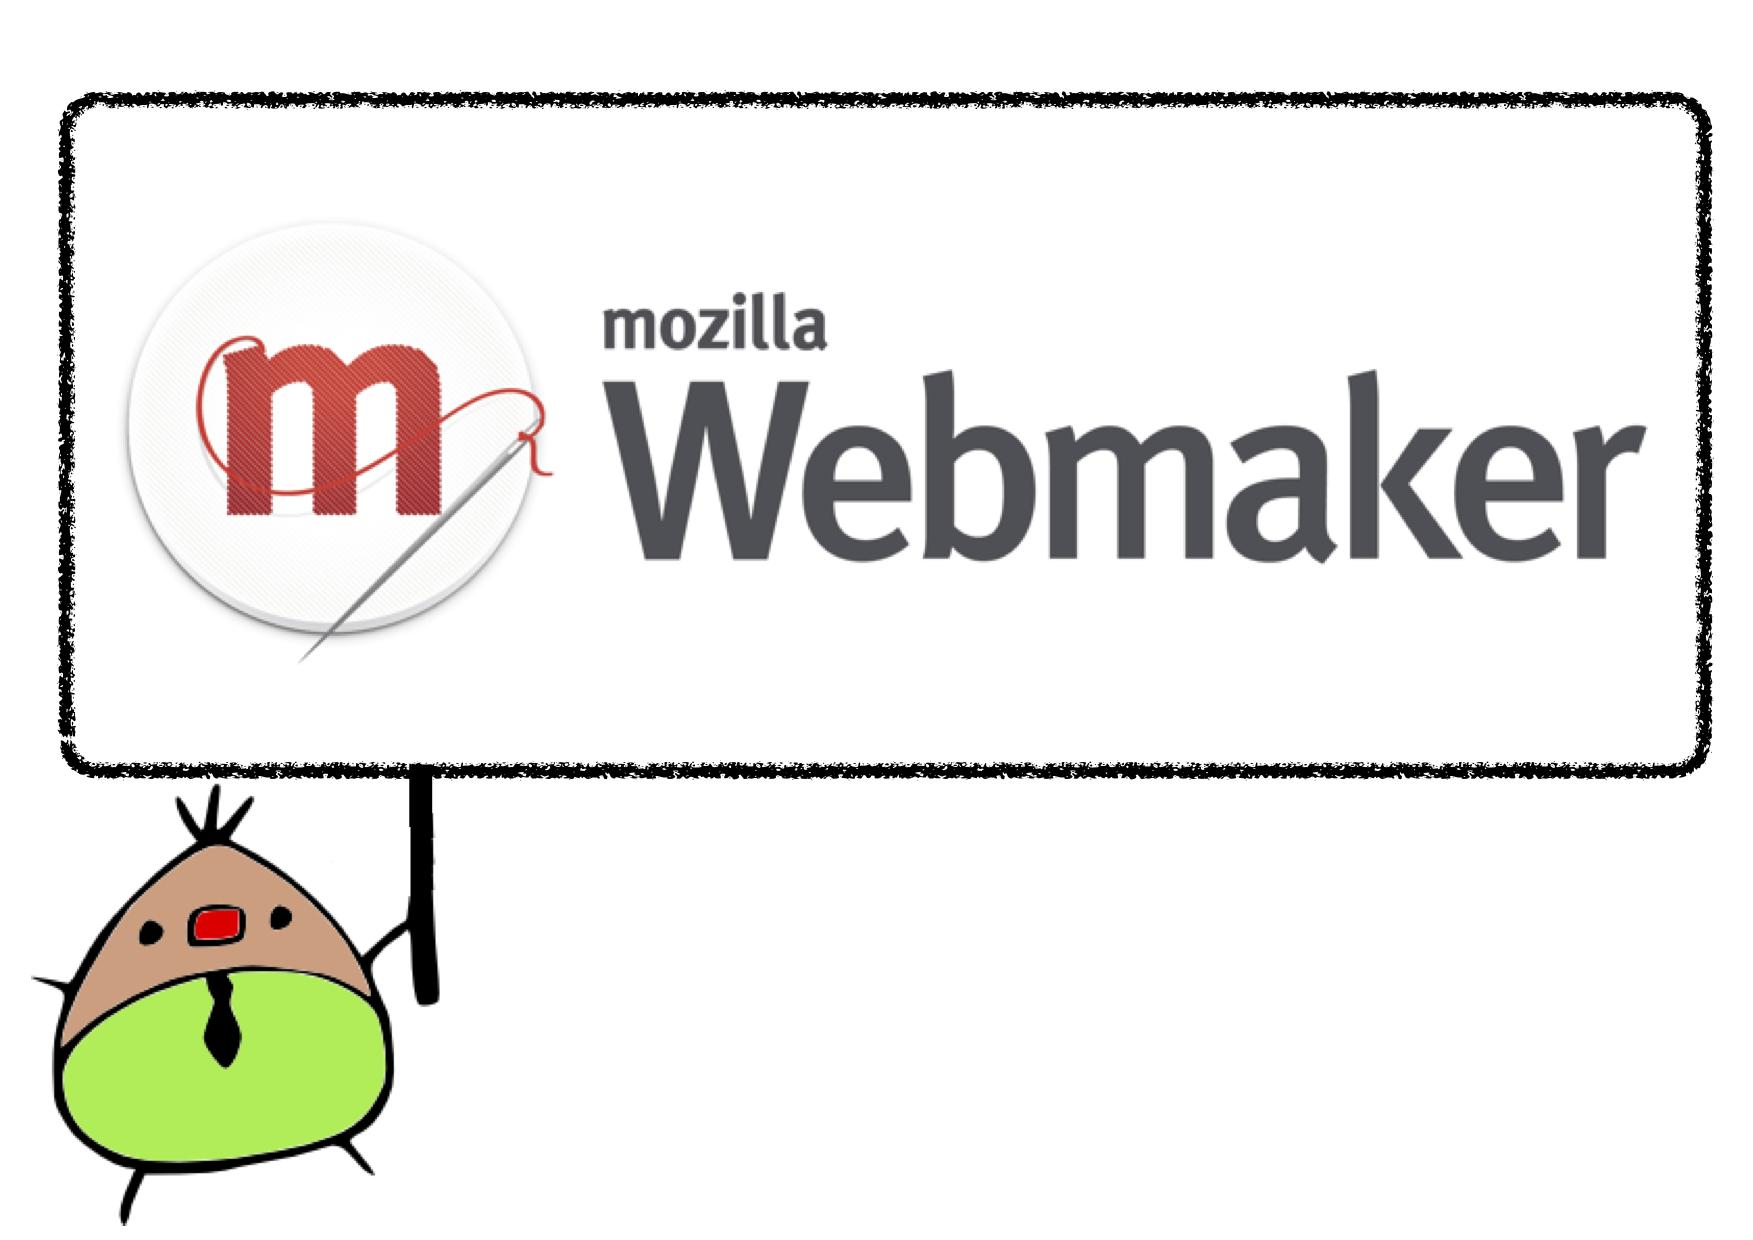 https://dl.dropboxusercontent.com/s/sj2so8mylp1lz2d/webmaker-kyokuri-logo.png?token_hash=AAH5cClC2P3W4xpIEV8r2Ut682RBYqgq46qPzy1lW9dP9g